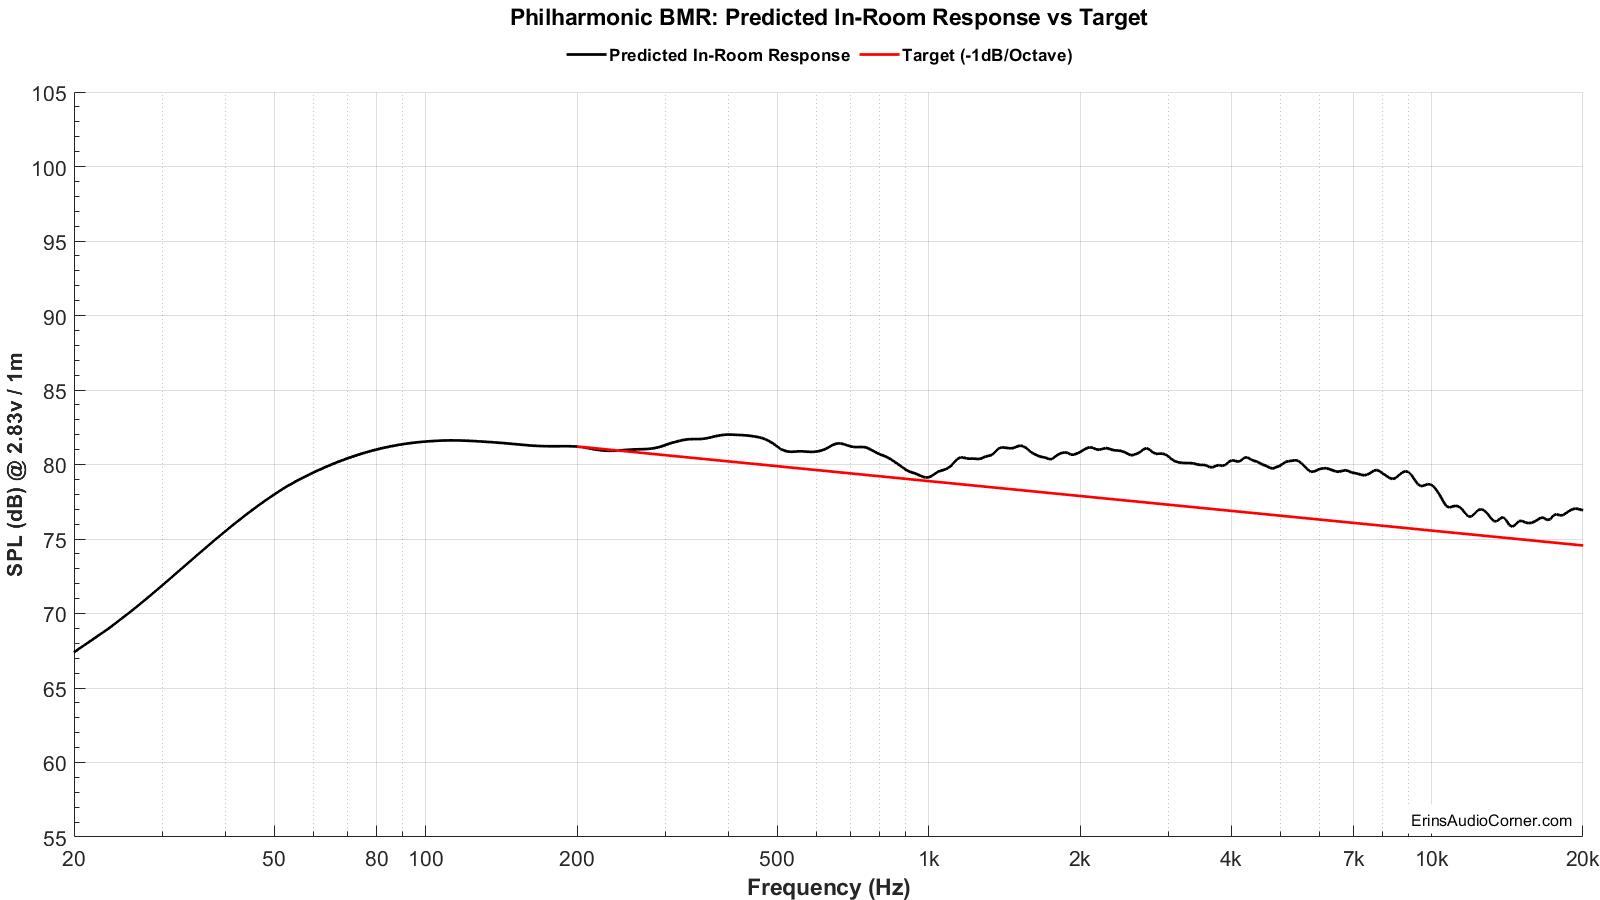 Philharmonic%20BMR_Predicted_vs_Target.png